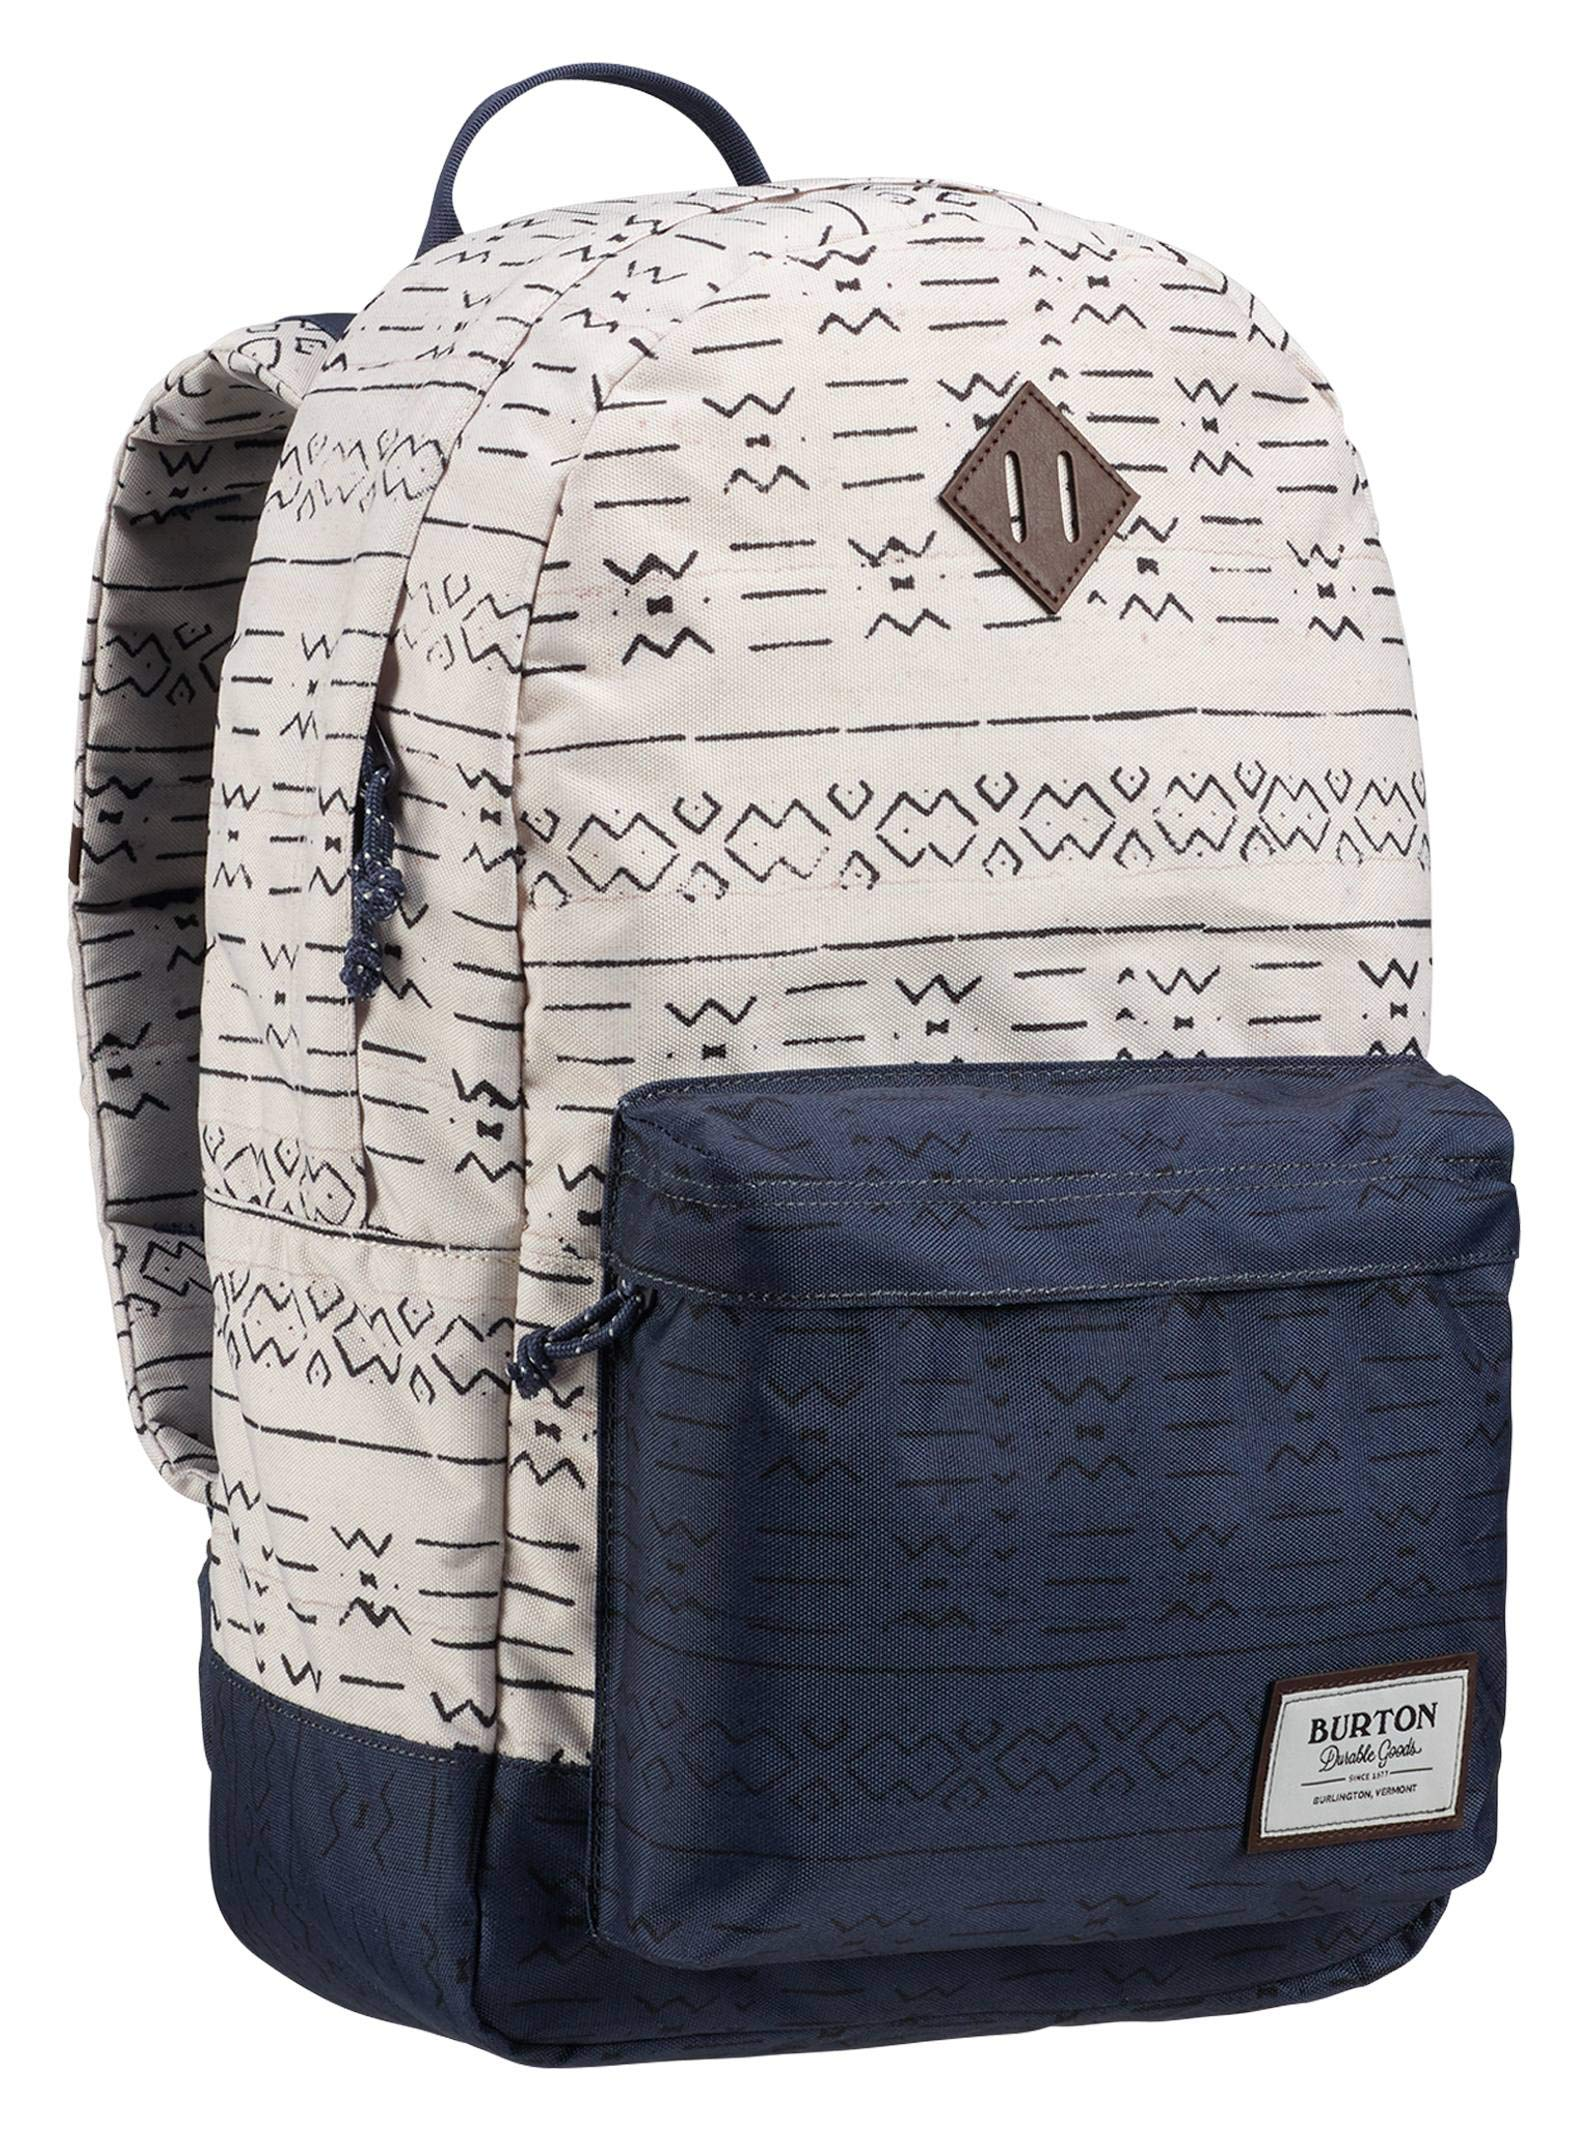 a40a81df50 Amazon.com  BURTON  BAGS   LUGGAGE